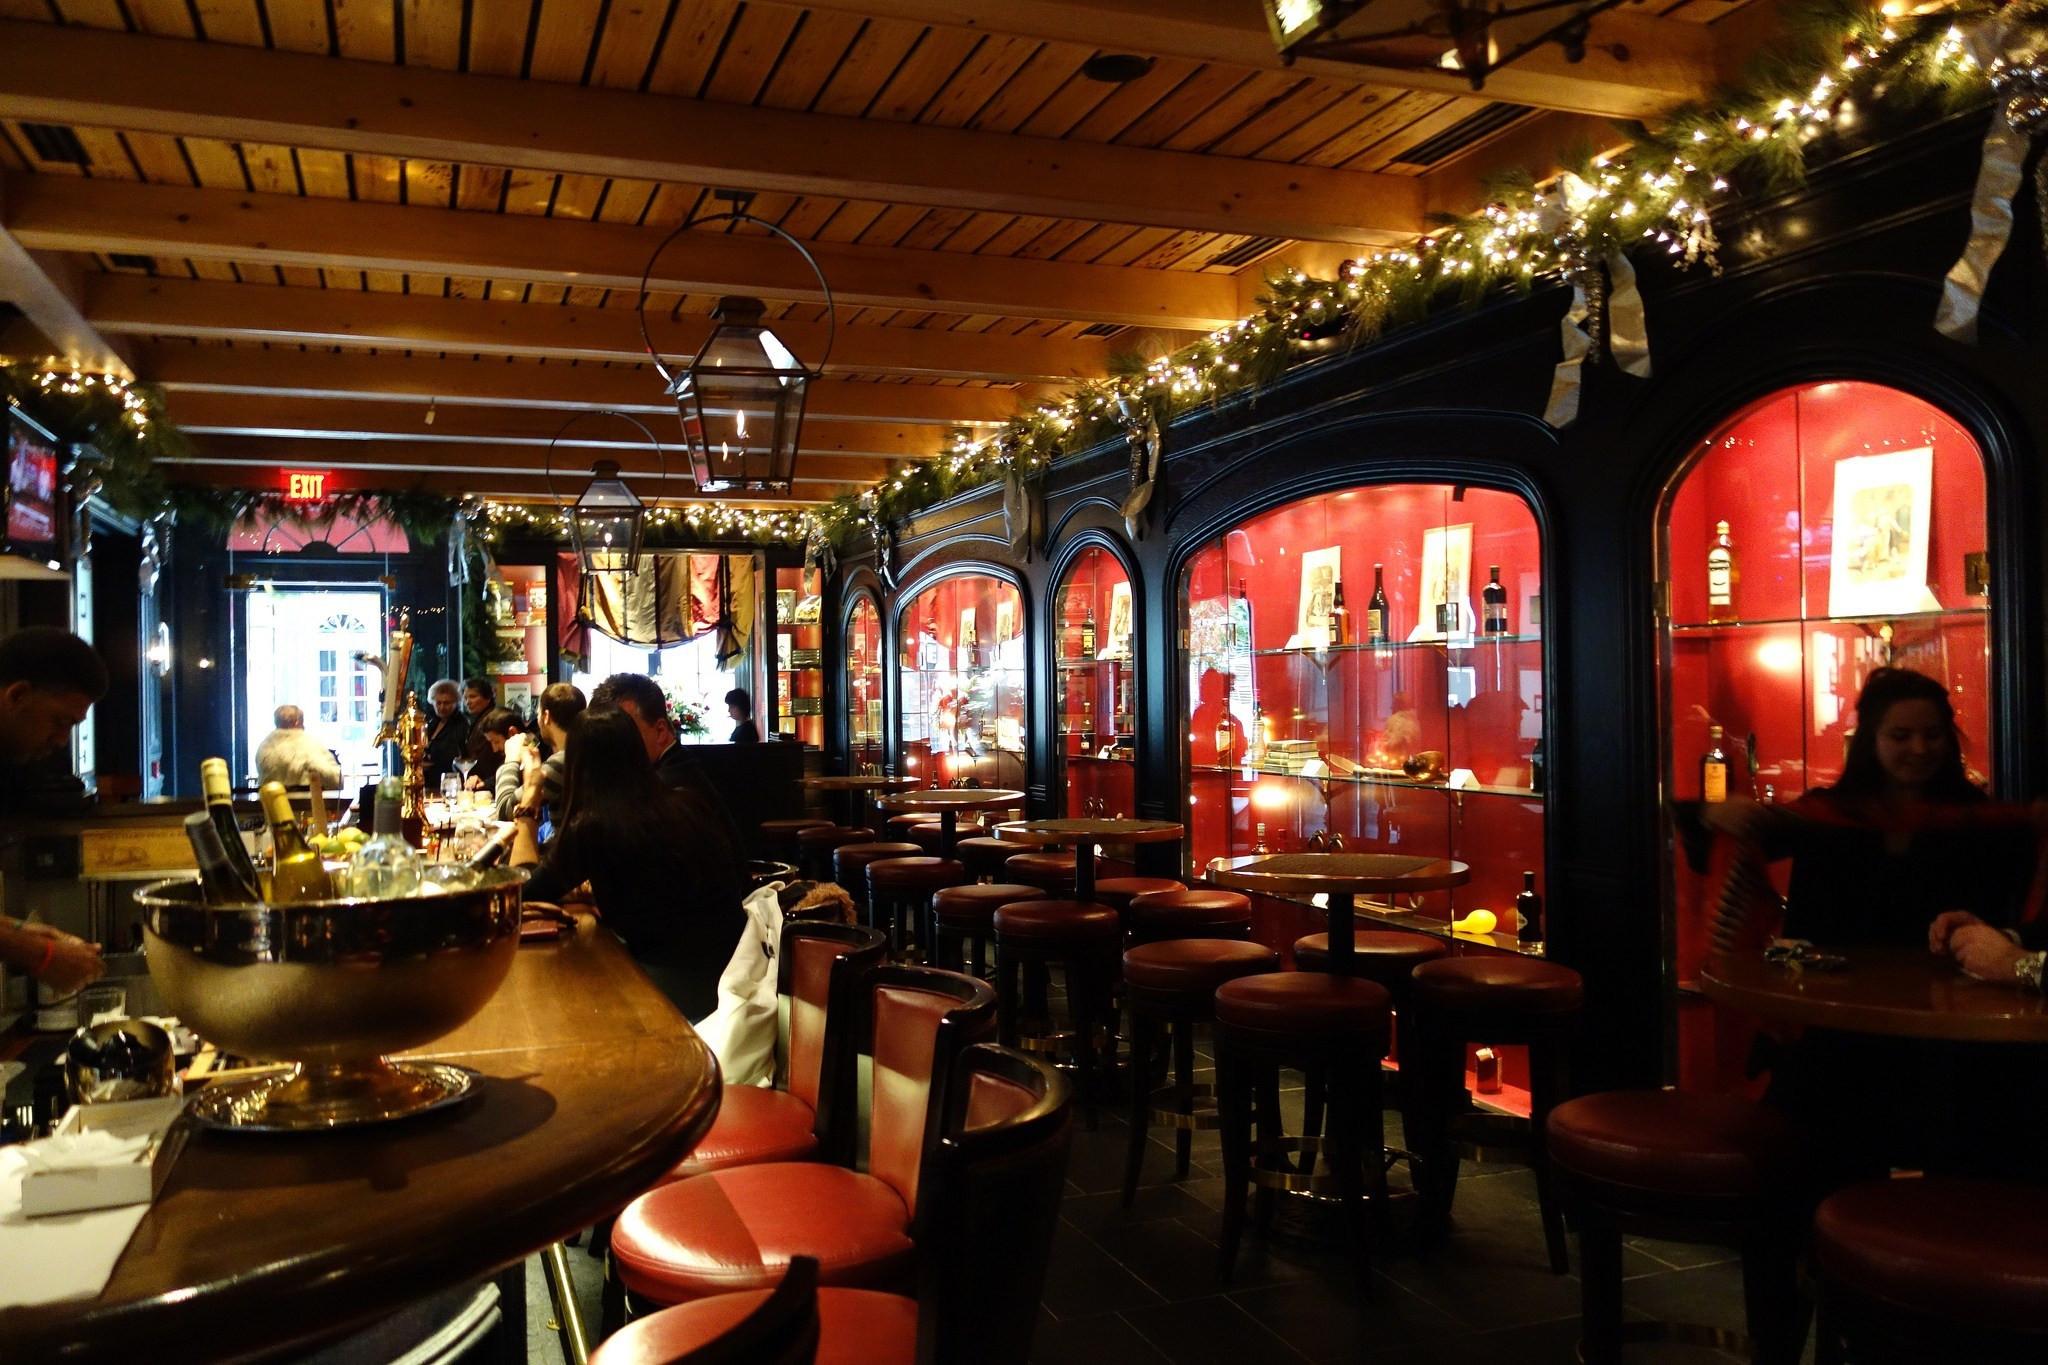 Christmas Dinners In New Orleans  Restaurants Open on Christmas Day in New Orleans